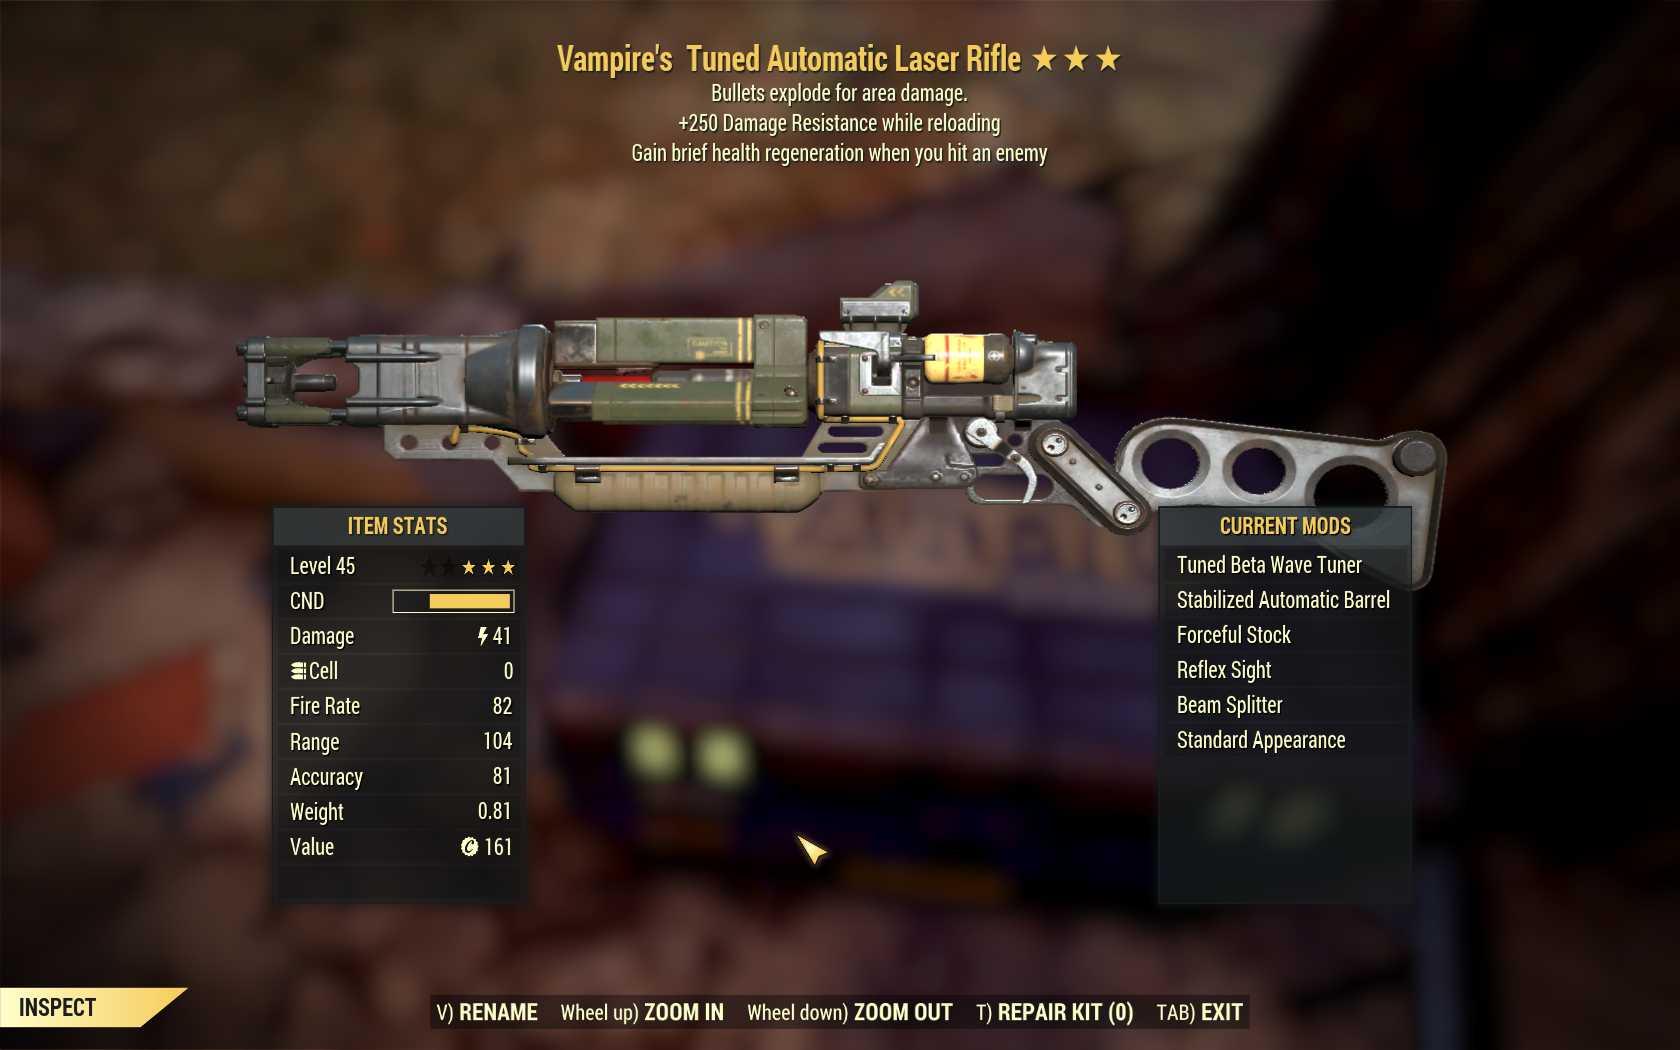 [3 Stars]Vampire's+Explosive Laser rifle+250 Damage Resistance WR